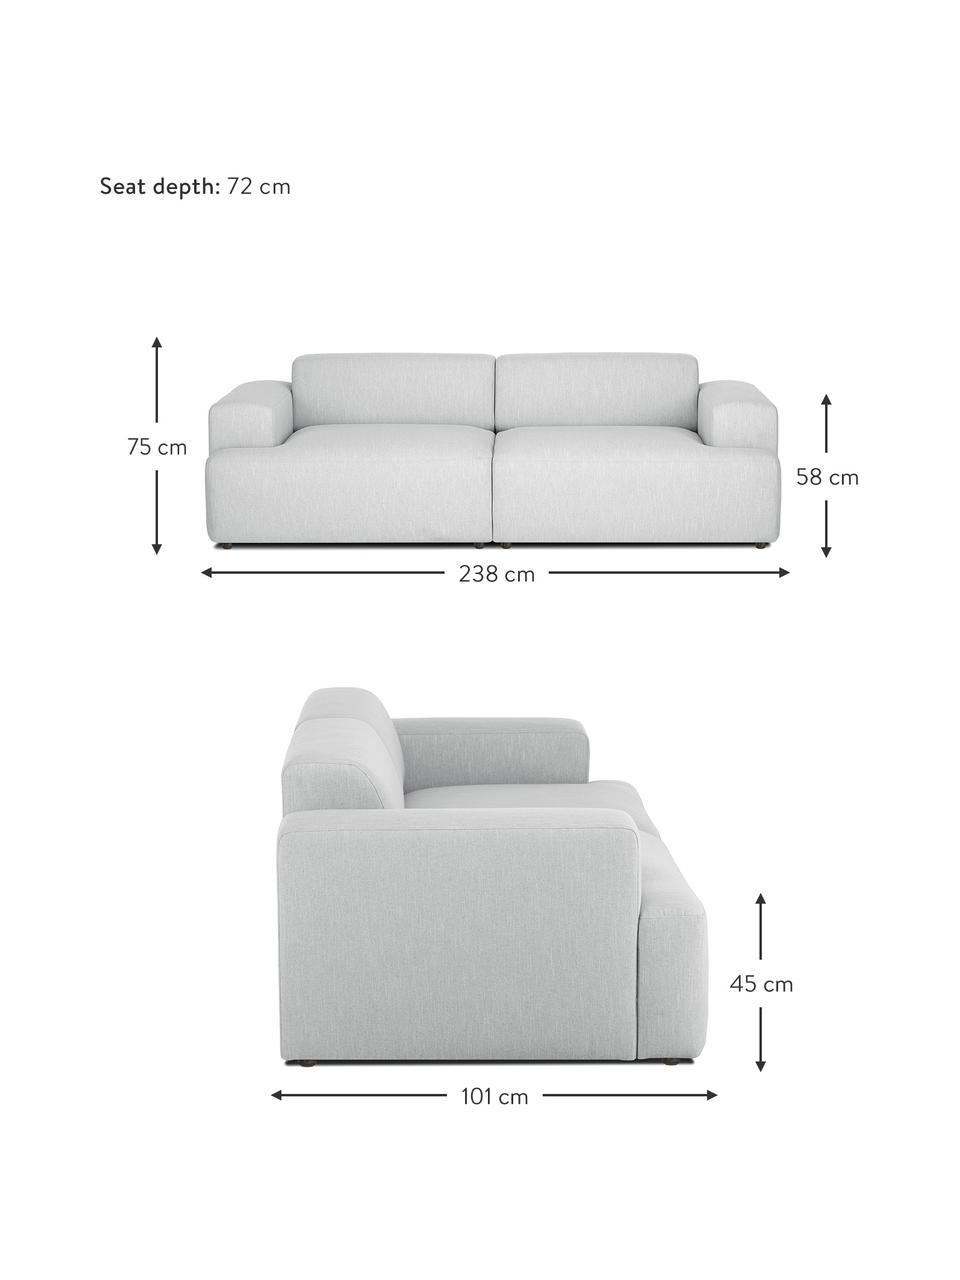 Bank Melva (3-zits) in lichtgrijs, Bekleding: 100% polyester, Frame: massief grenenhout, FSC-g, Poten: kunststof, Lichtgrijs, 238 x 101 cm